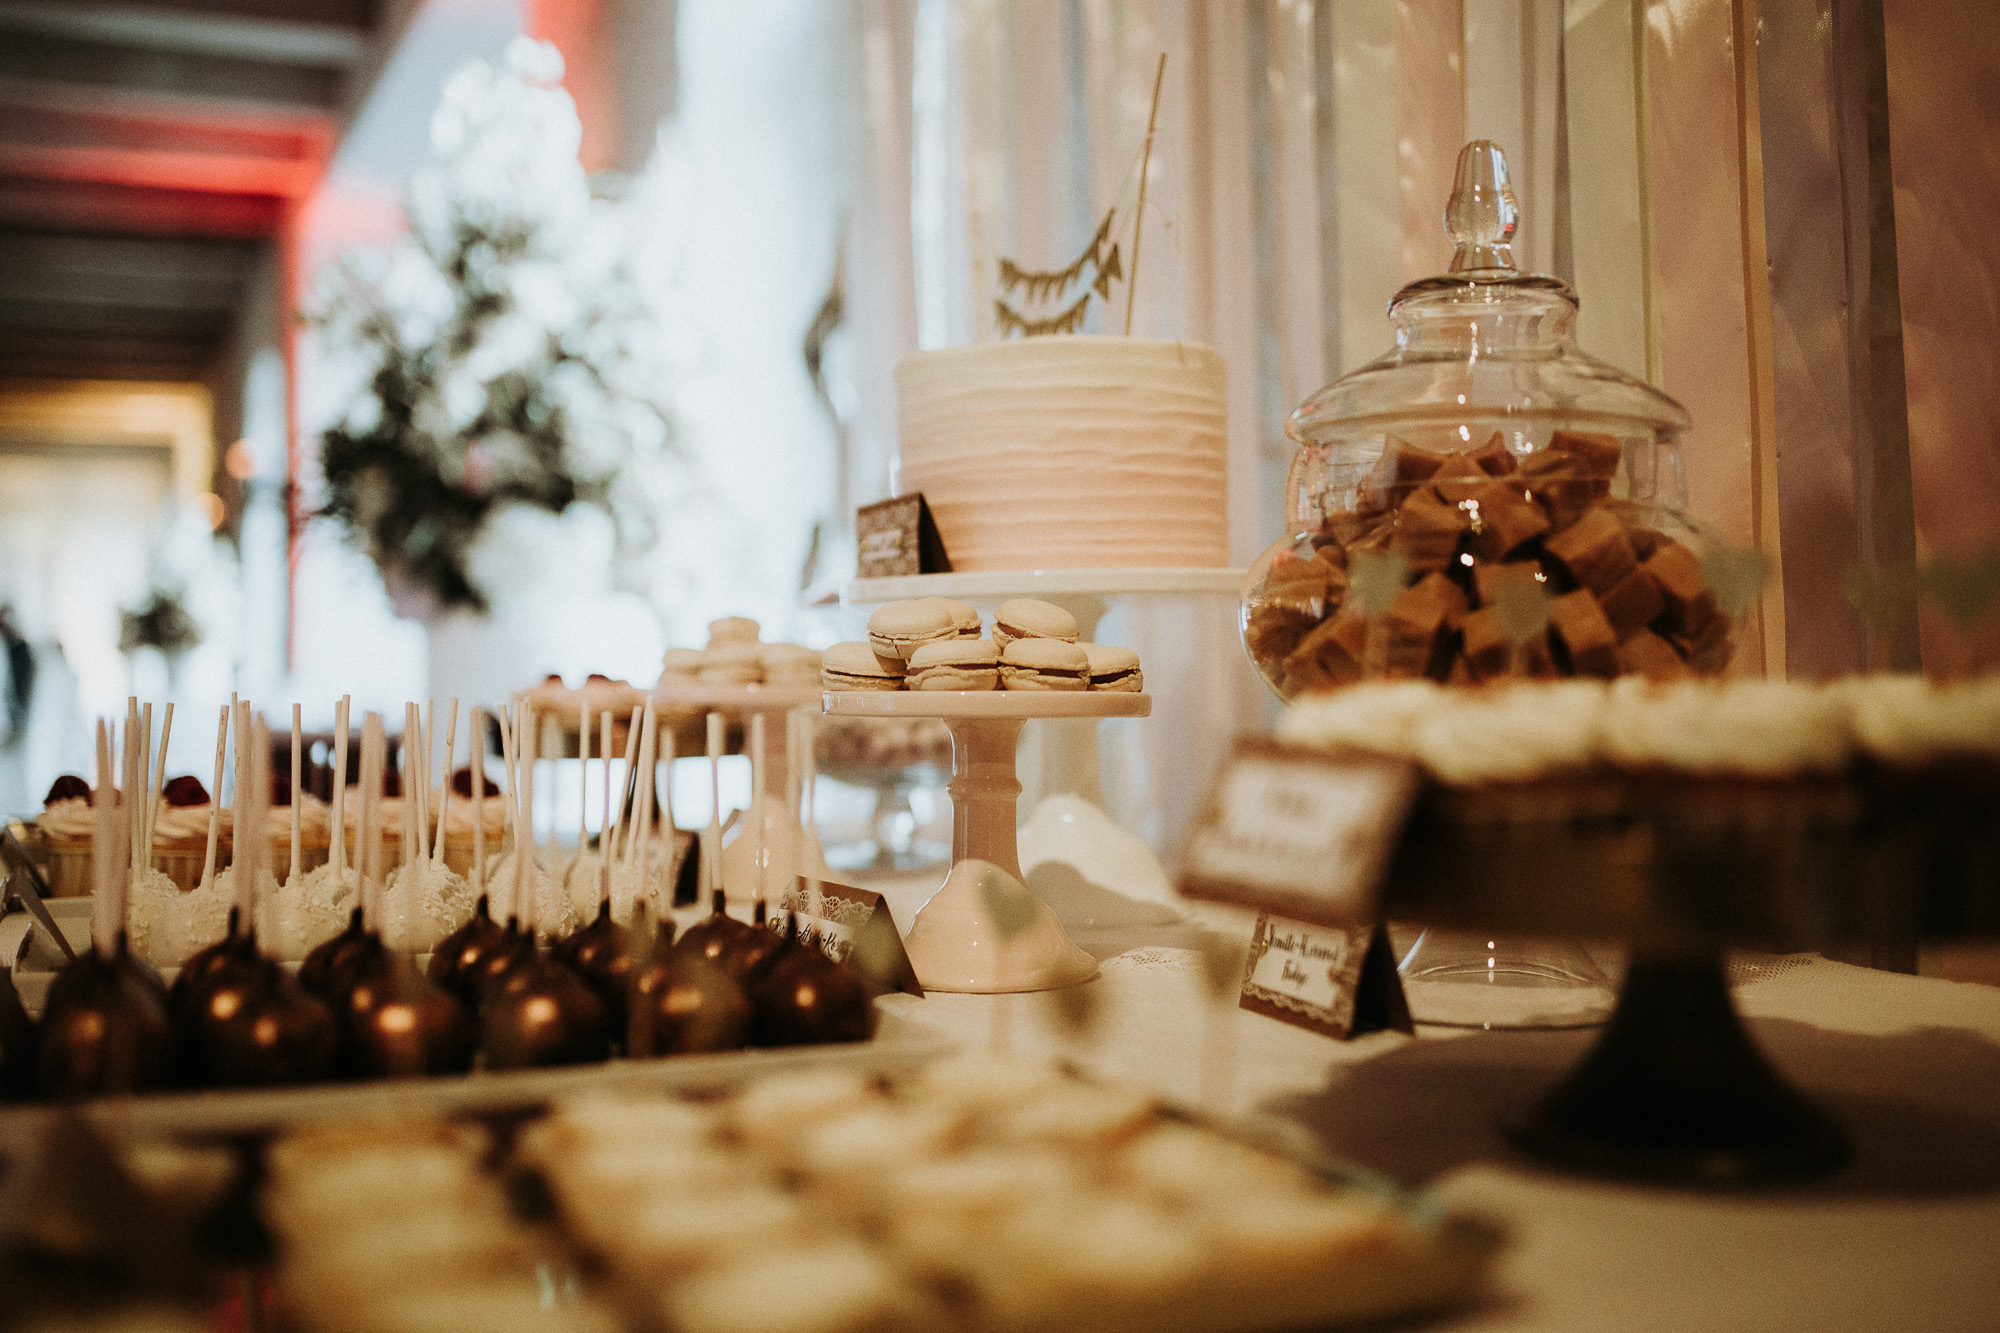 DanielaMarquardtPhotography_Hochzeitsfotograf_Düsseldorf_Köln_Mallorca_Bayern_Austria_Harz_Wedding_AileenundLennart_Weddingphotographer_Ibiza_Tuskany_Italien_Toskana_Portugal_Lissabon215